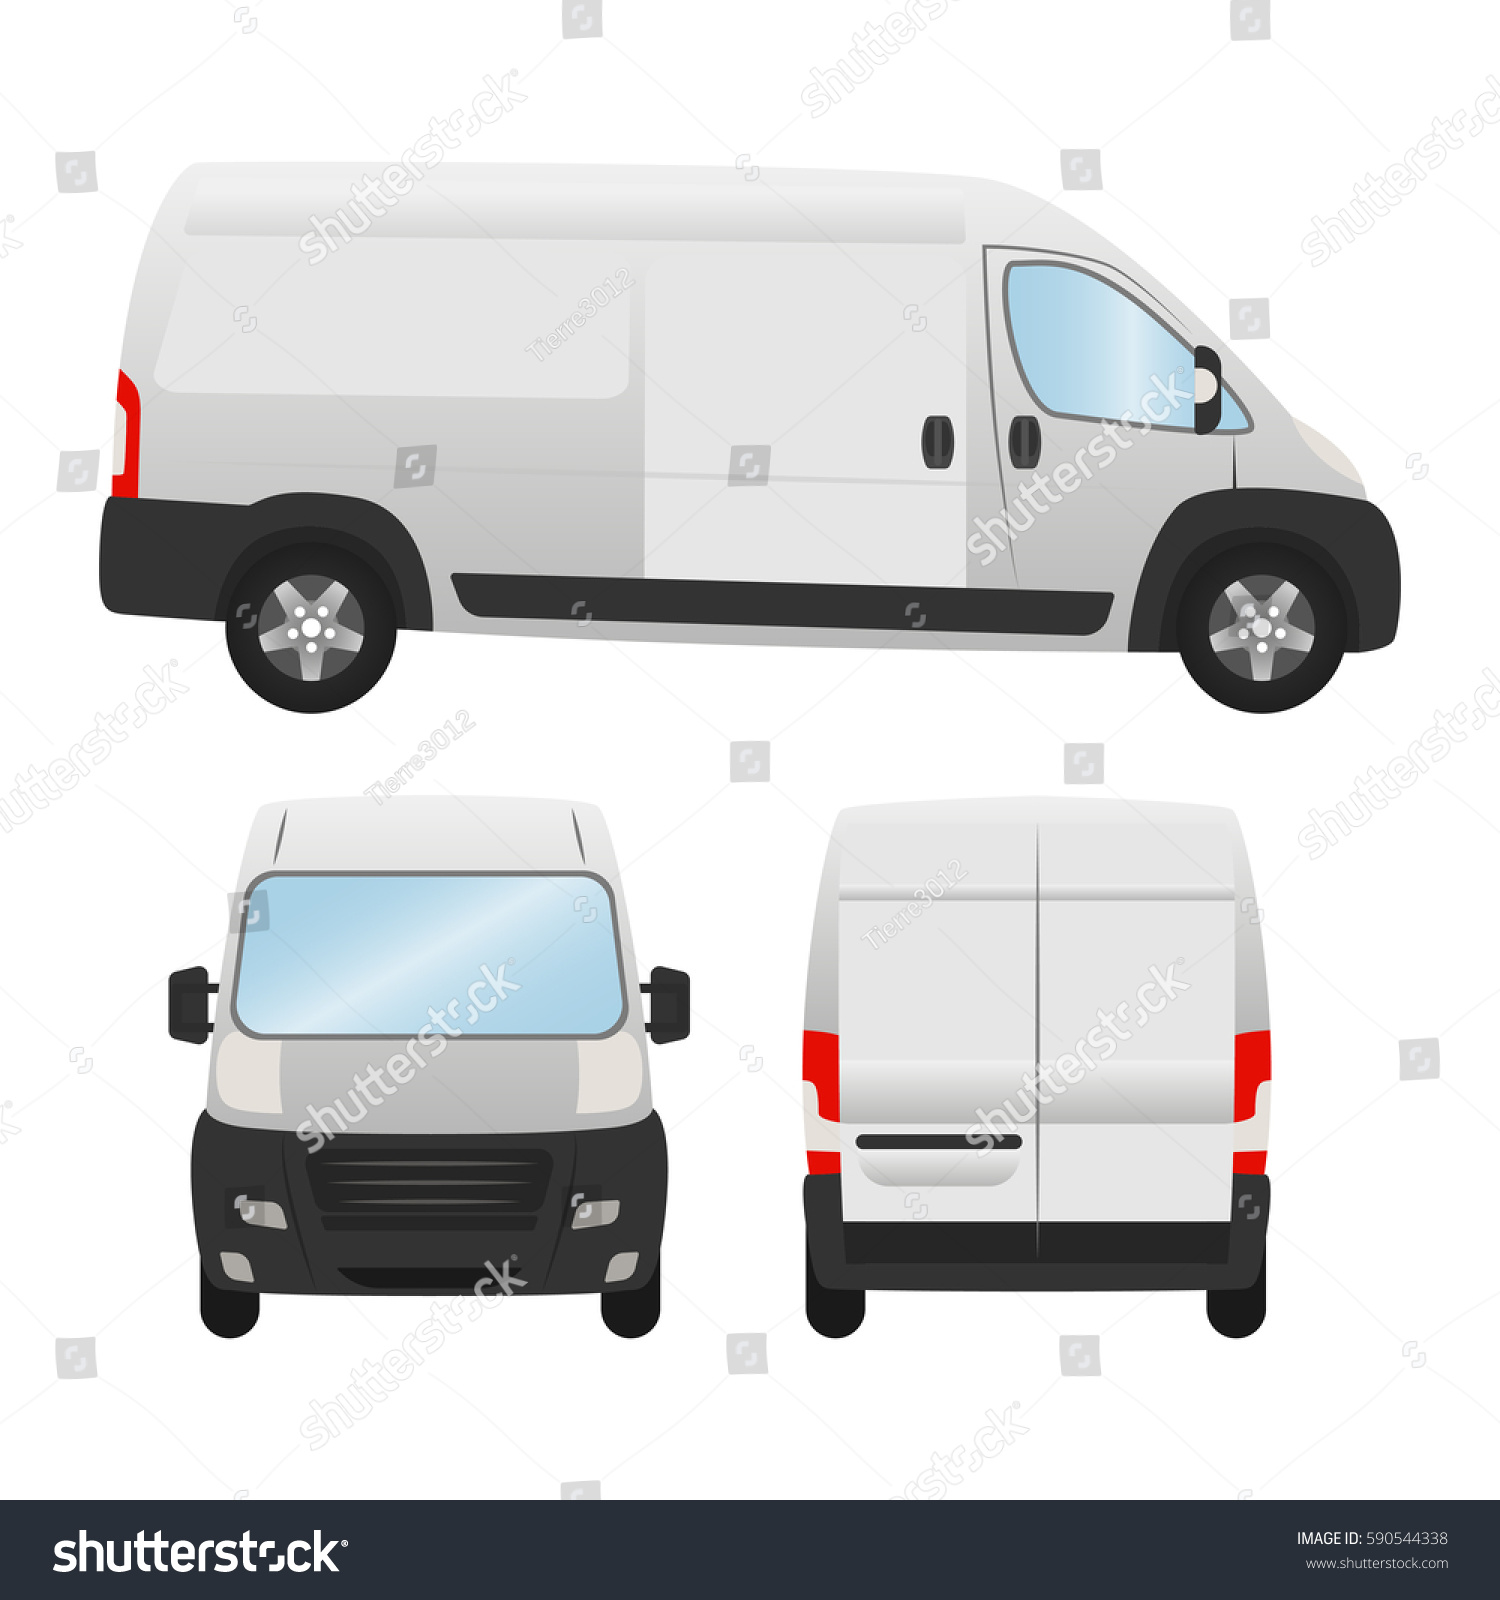 Delivery Van Template Presentation Ad Vector Stock Vector ...